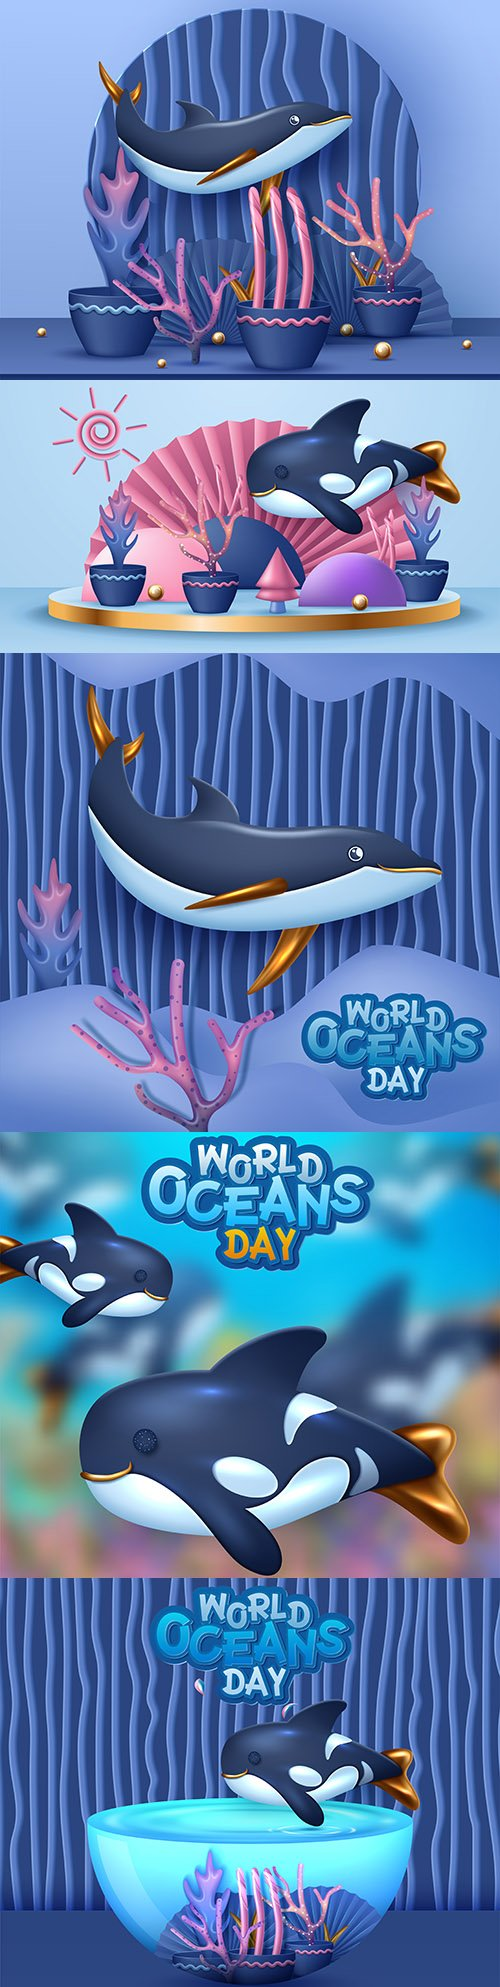 World ocean day with marine dwellers cartoon 3d illustrations